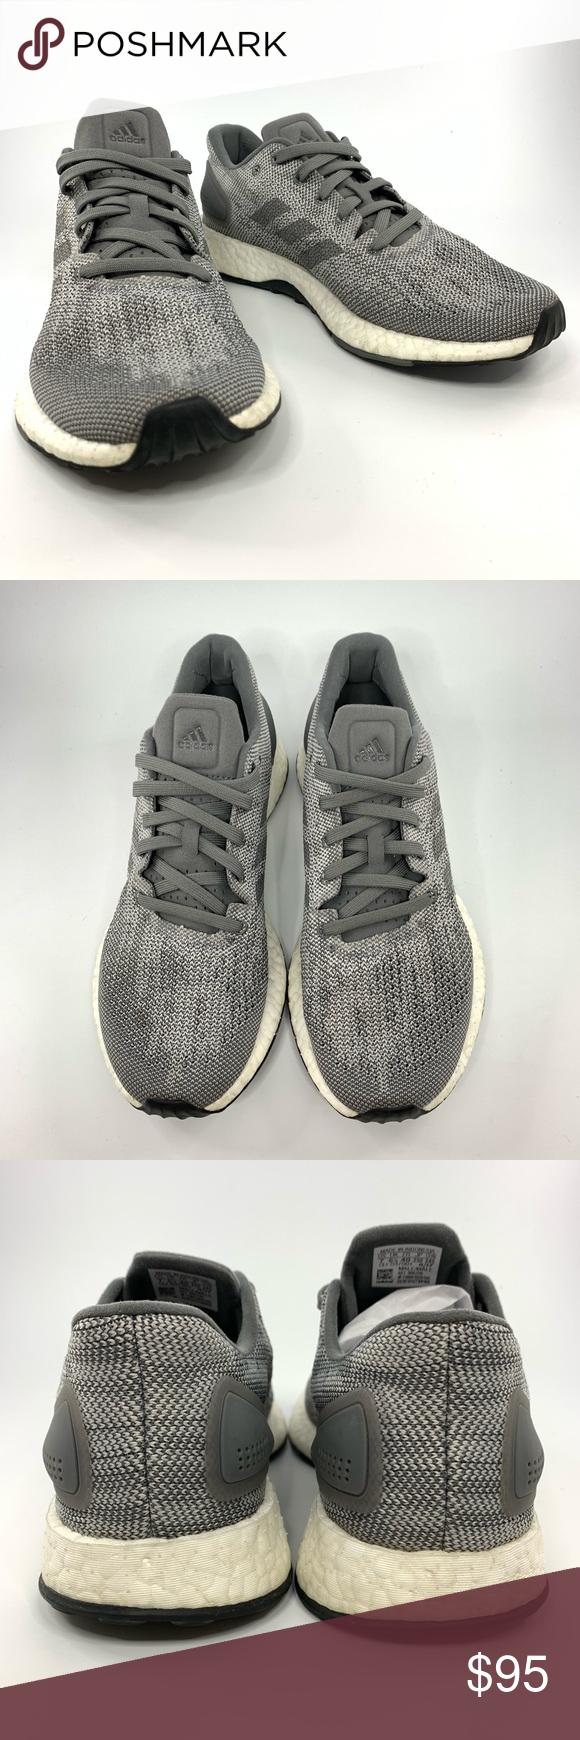 Adidas Pureboost DPR Lightly worn, Fantastic condition with